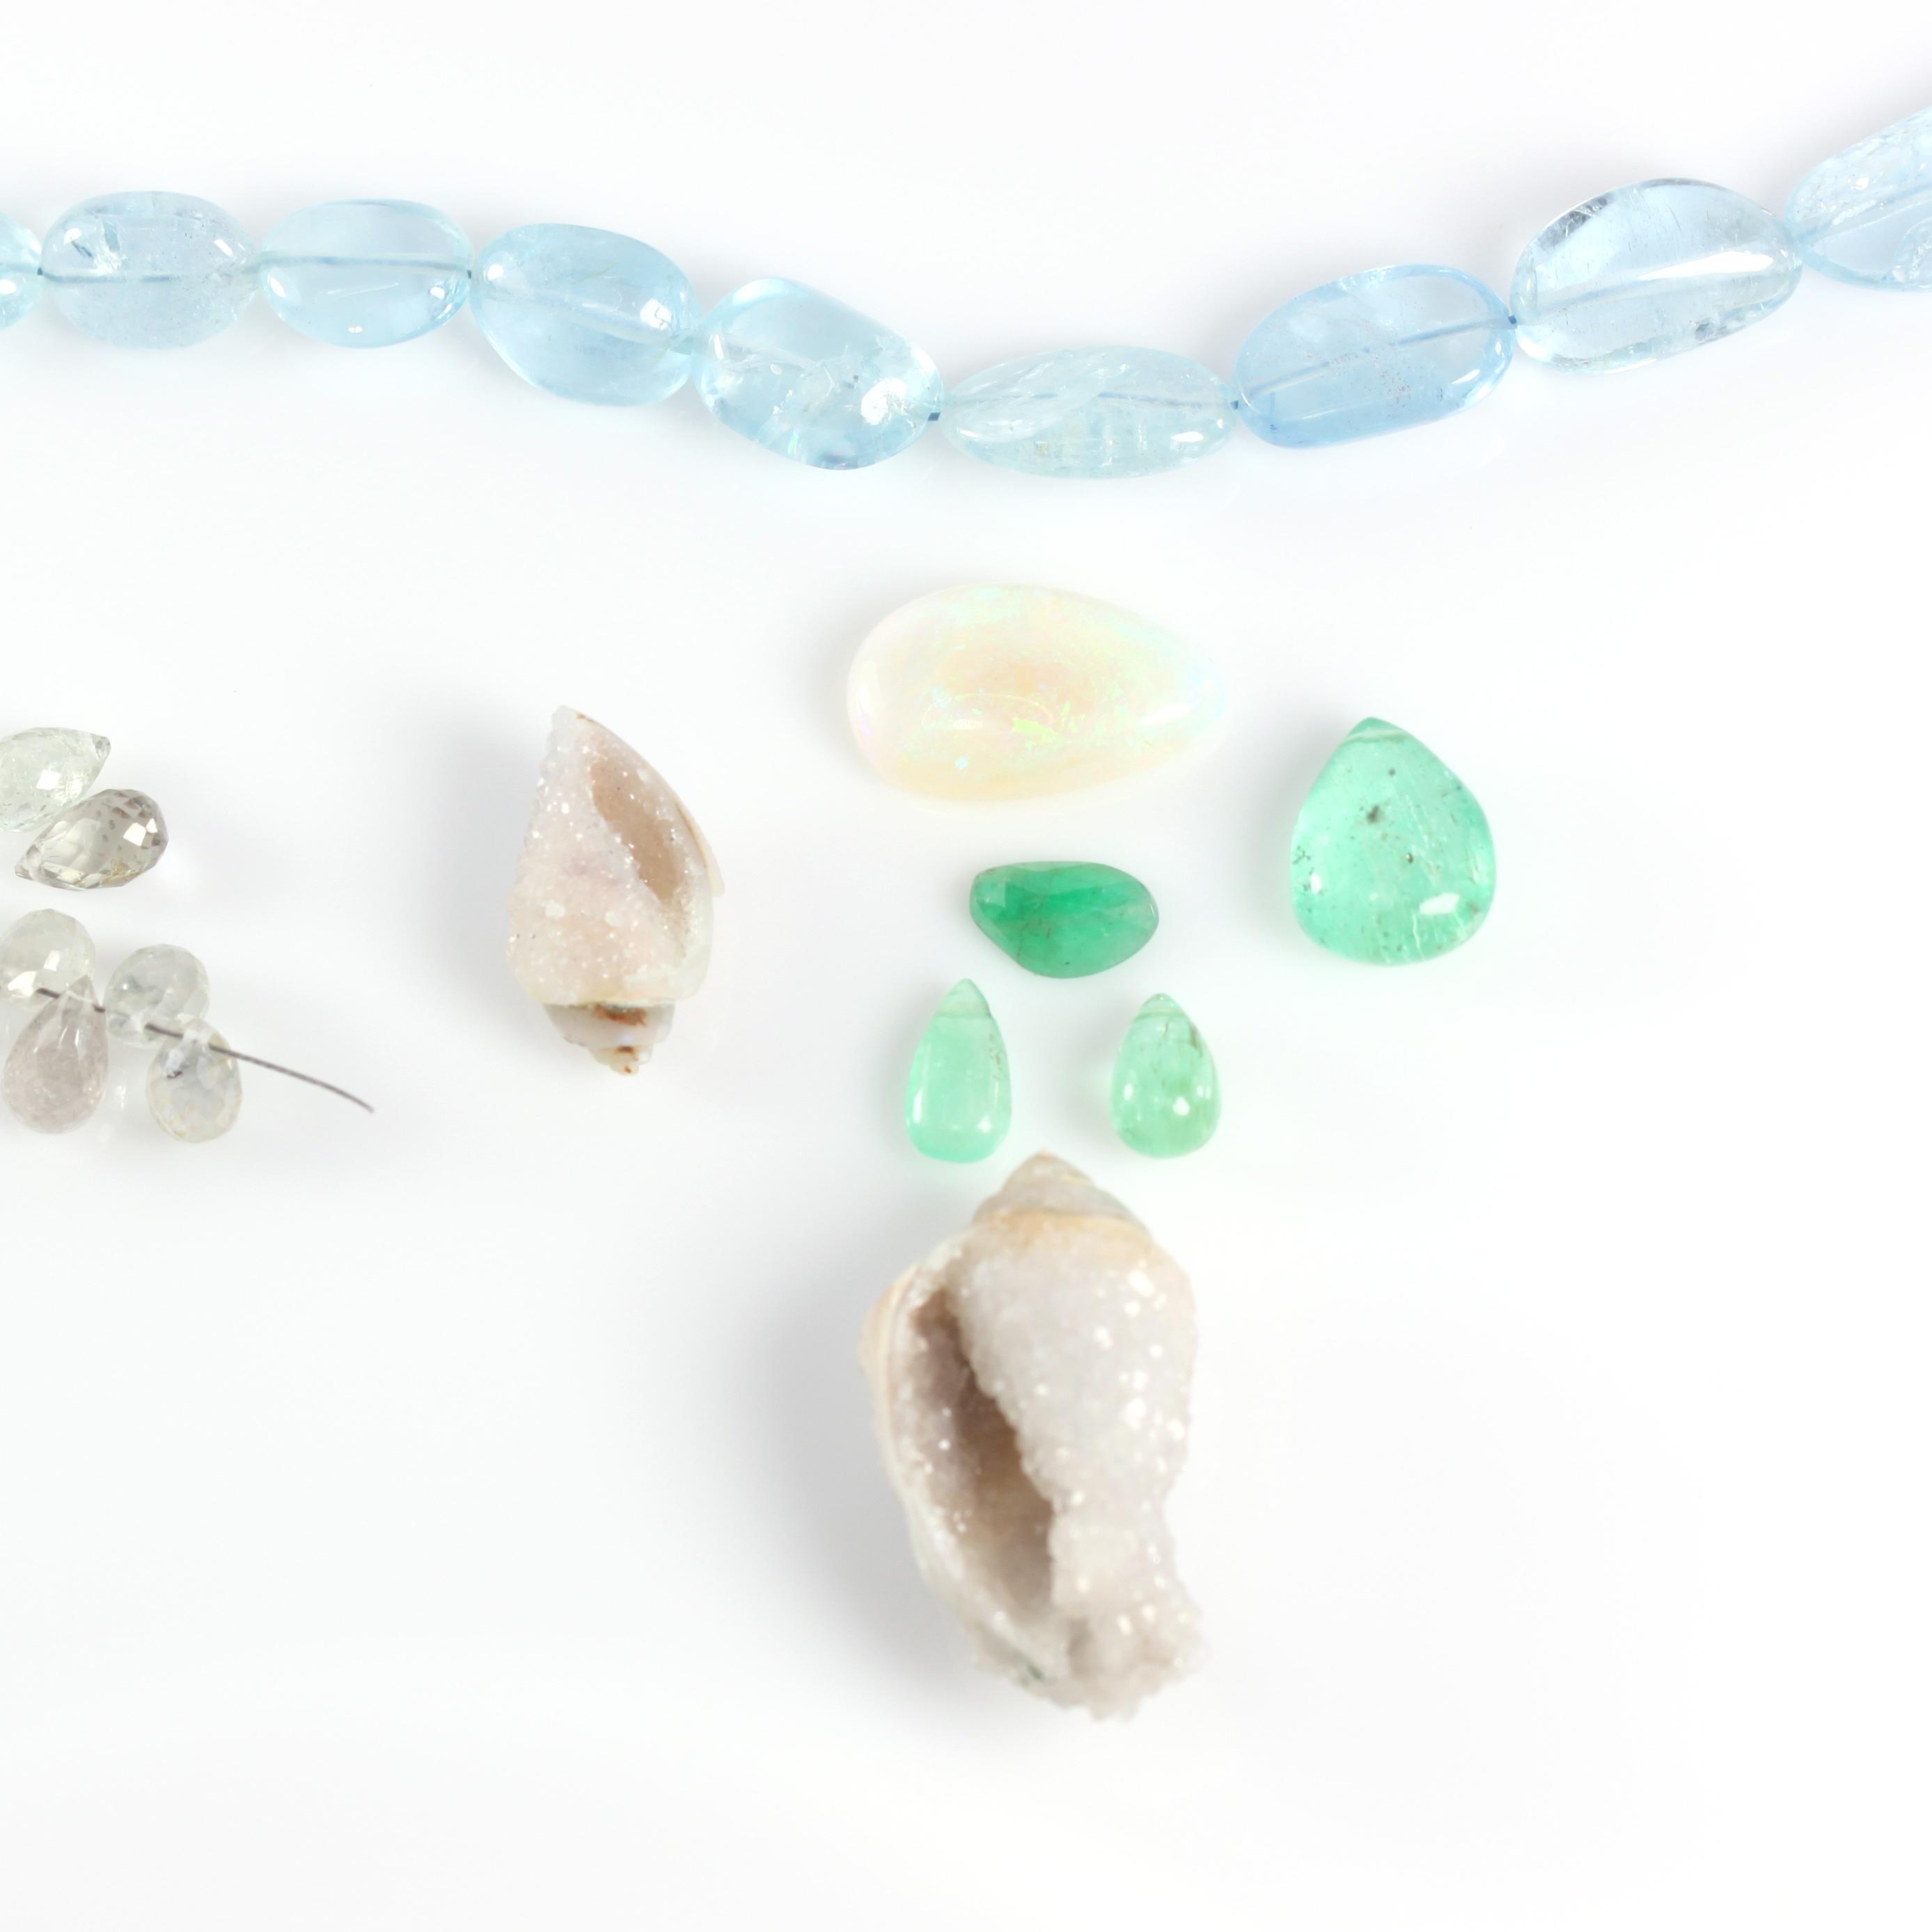 Components For Custom Necklace - Opal, Aquamarine,  Emerald, White Sapphires & Druzy Fossil Seashells